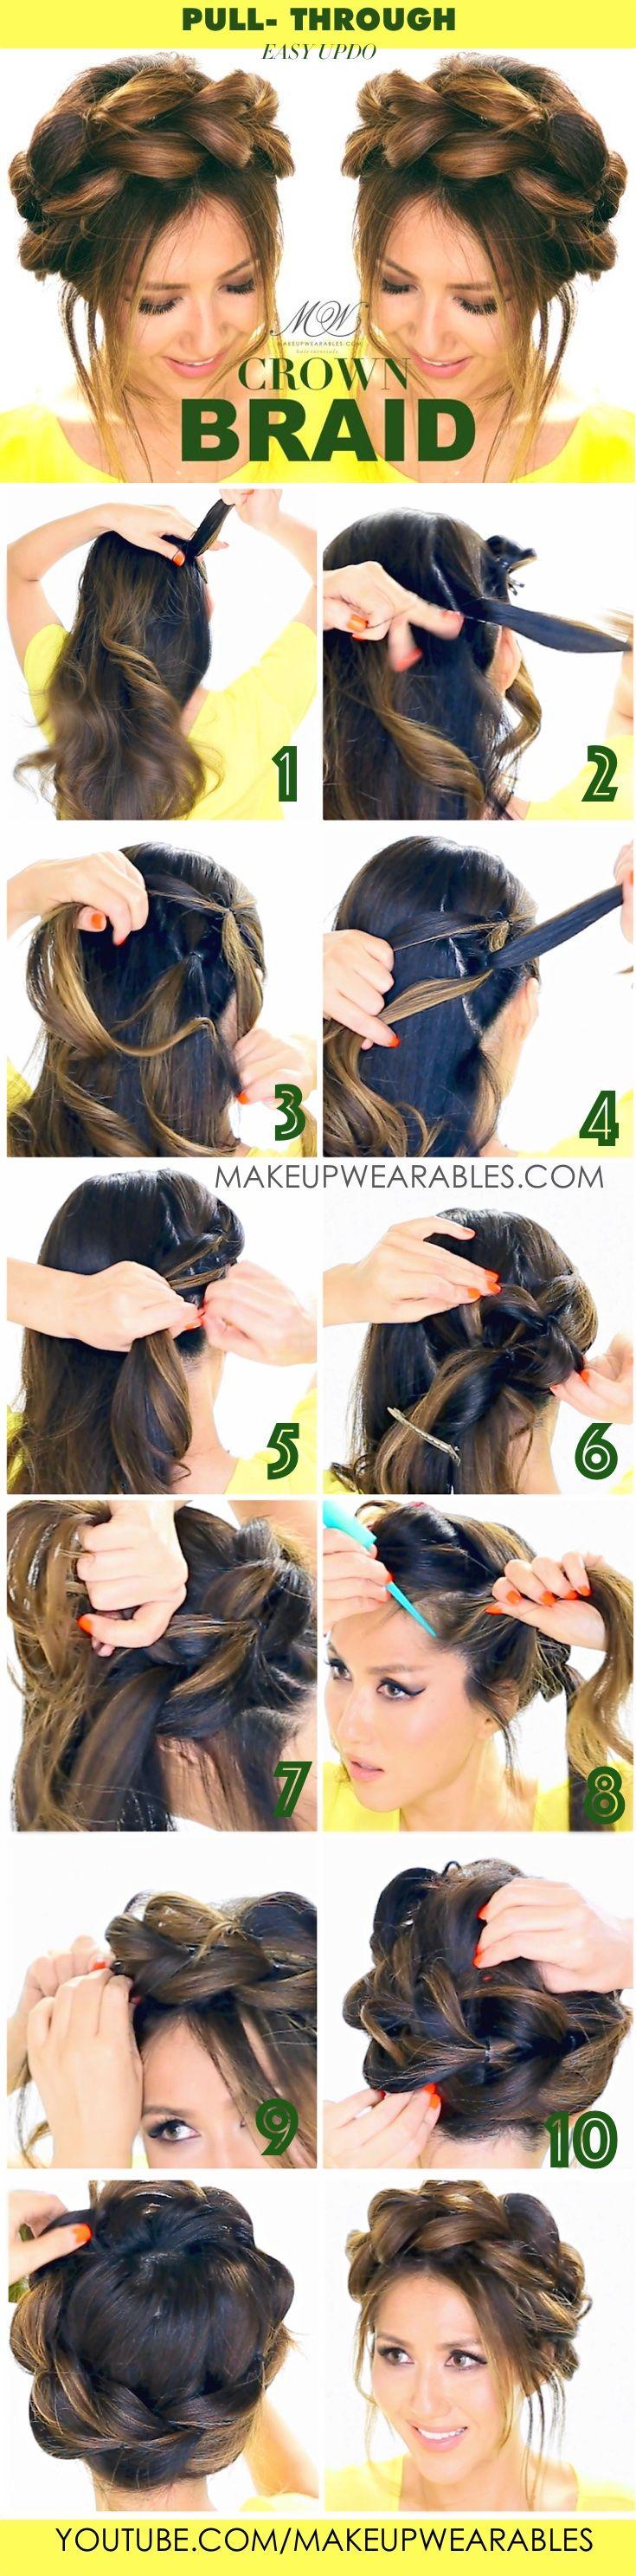 Swell 1000 Ideas About Braided Hair Tutorials On Pinterest Hair Short Hairstyles For Black Women Fulllsitofus